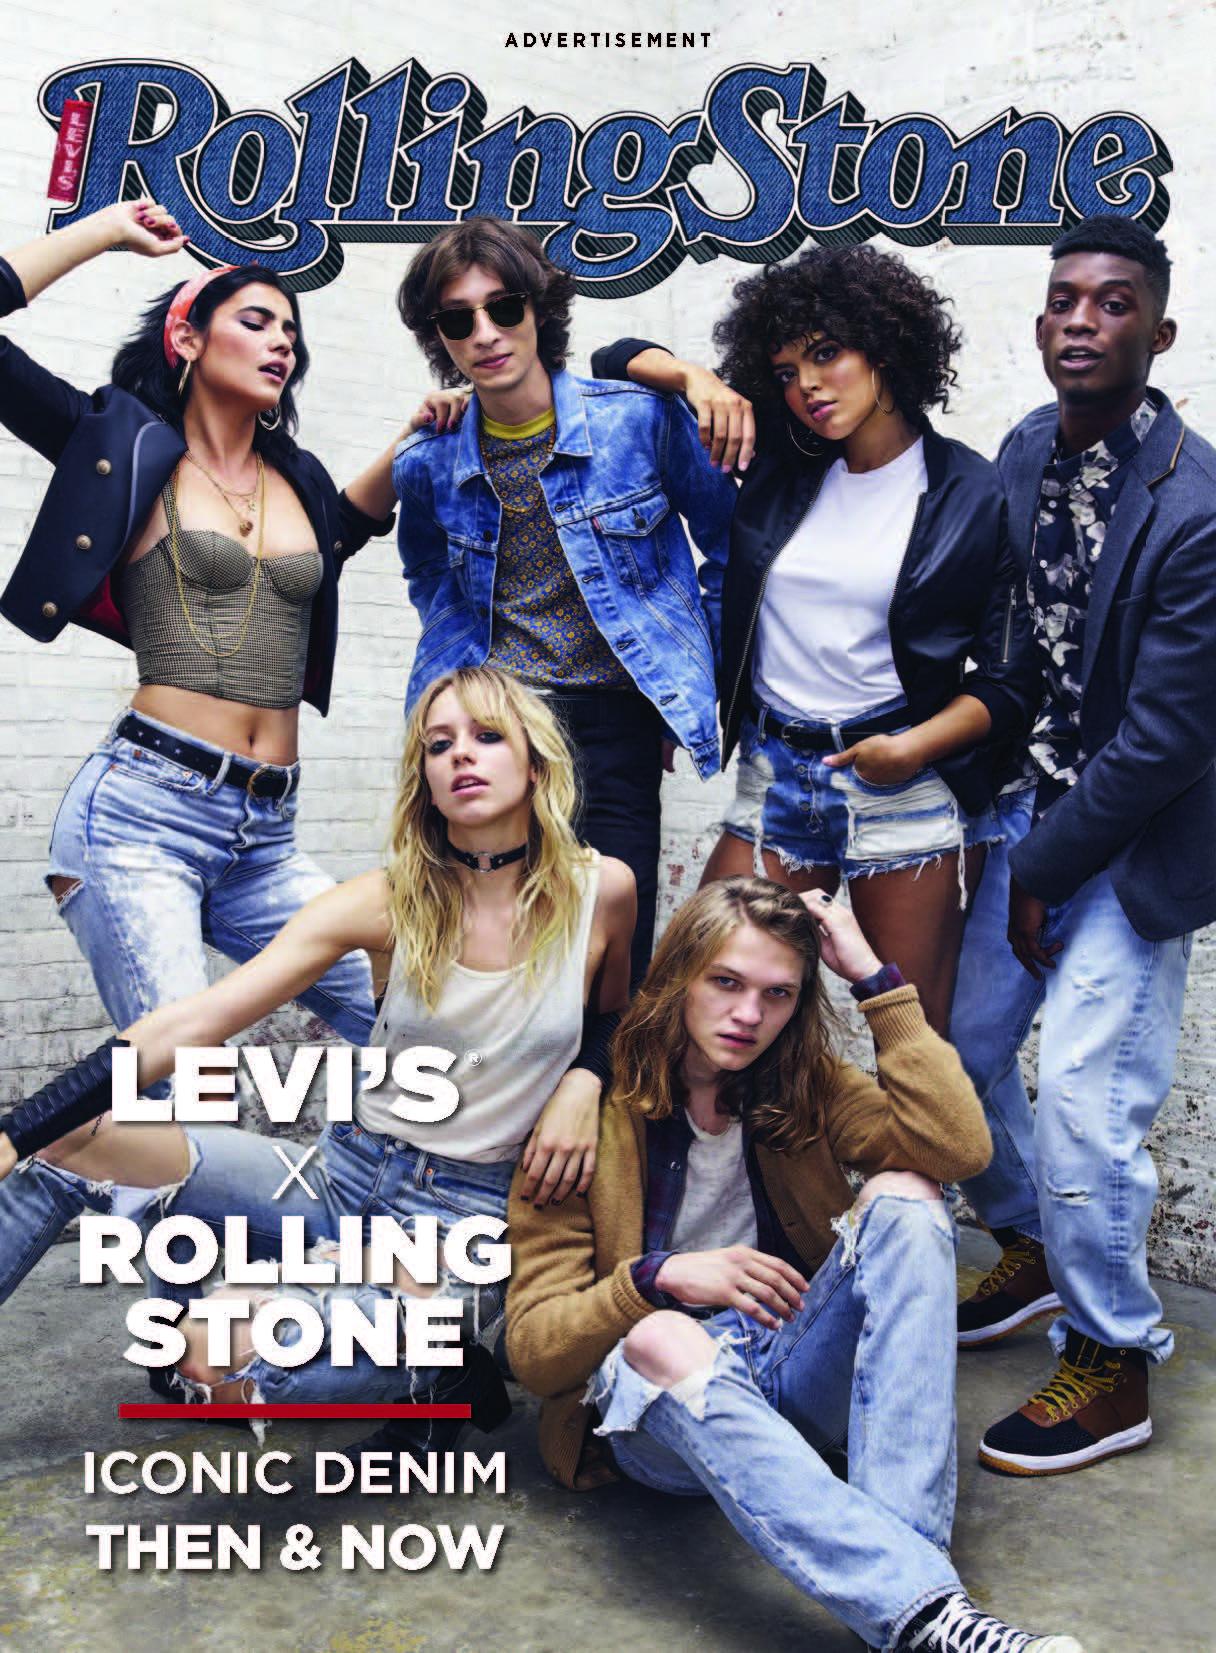 Levi's / Rolling Stone 50th Anniversary